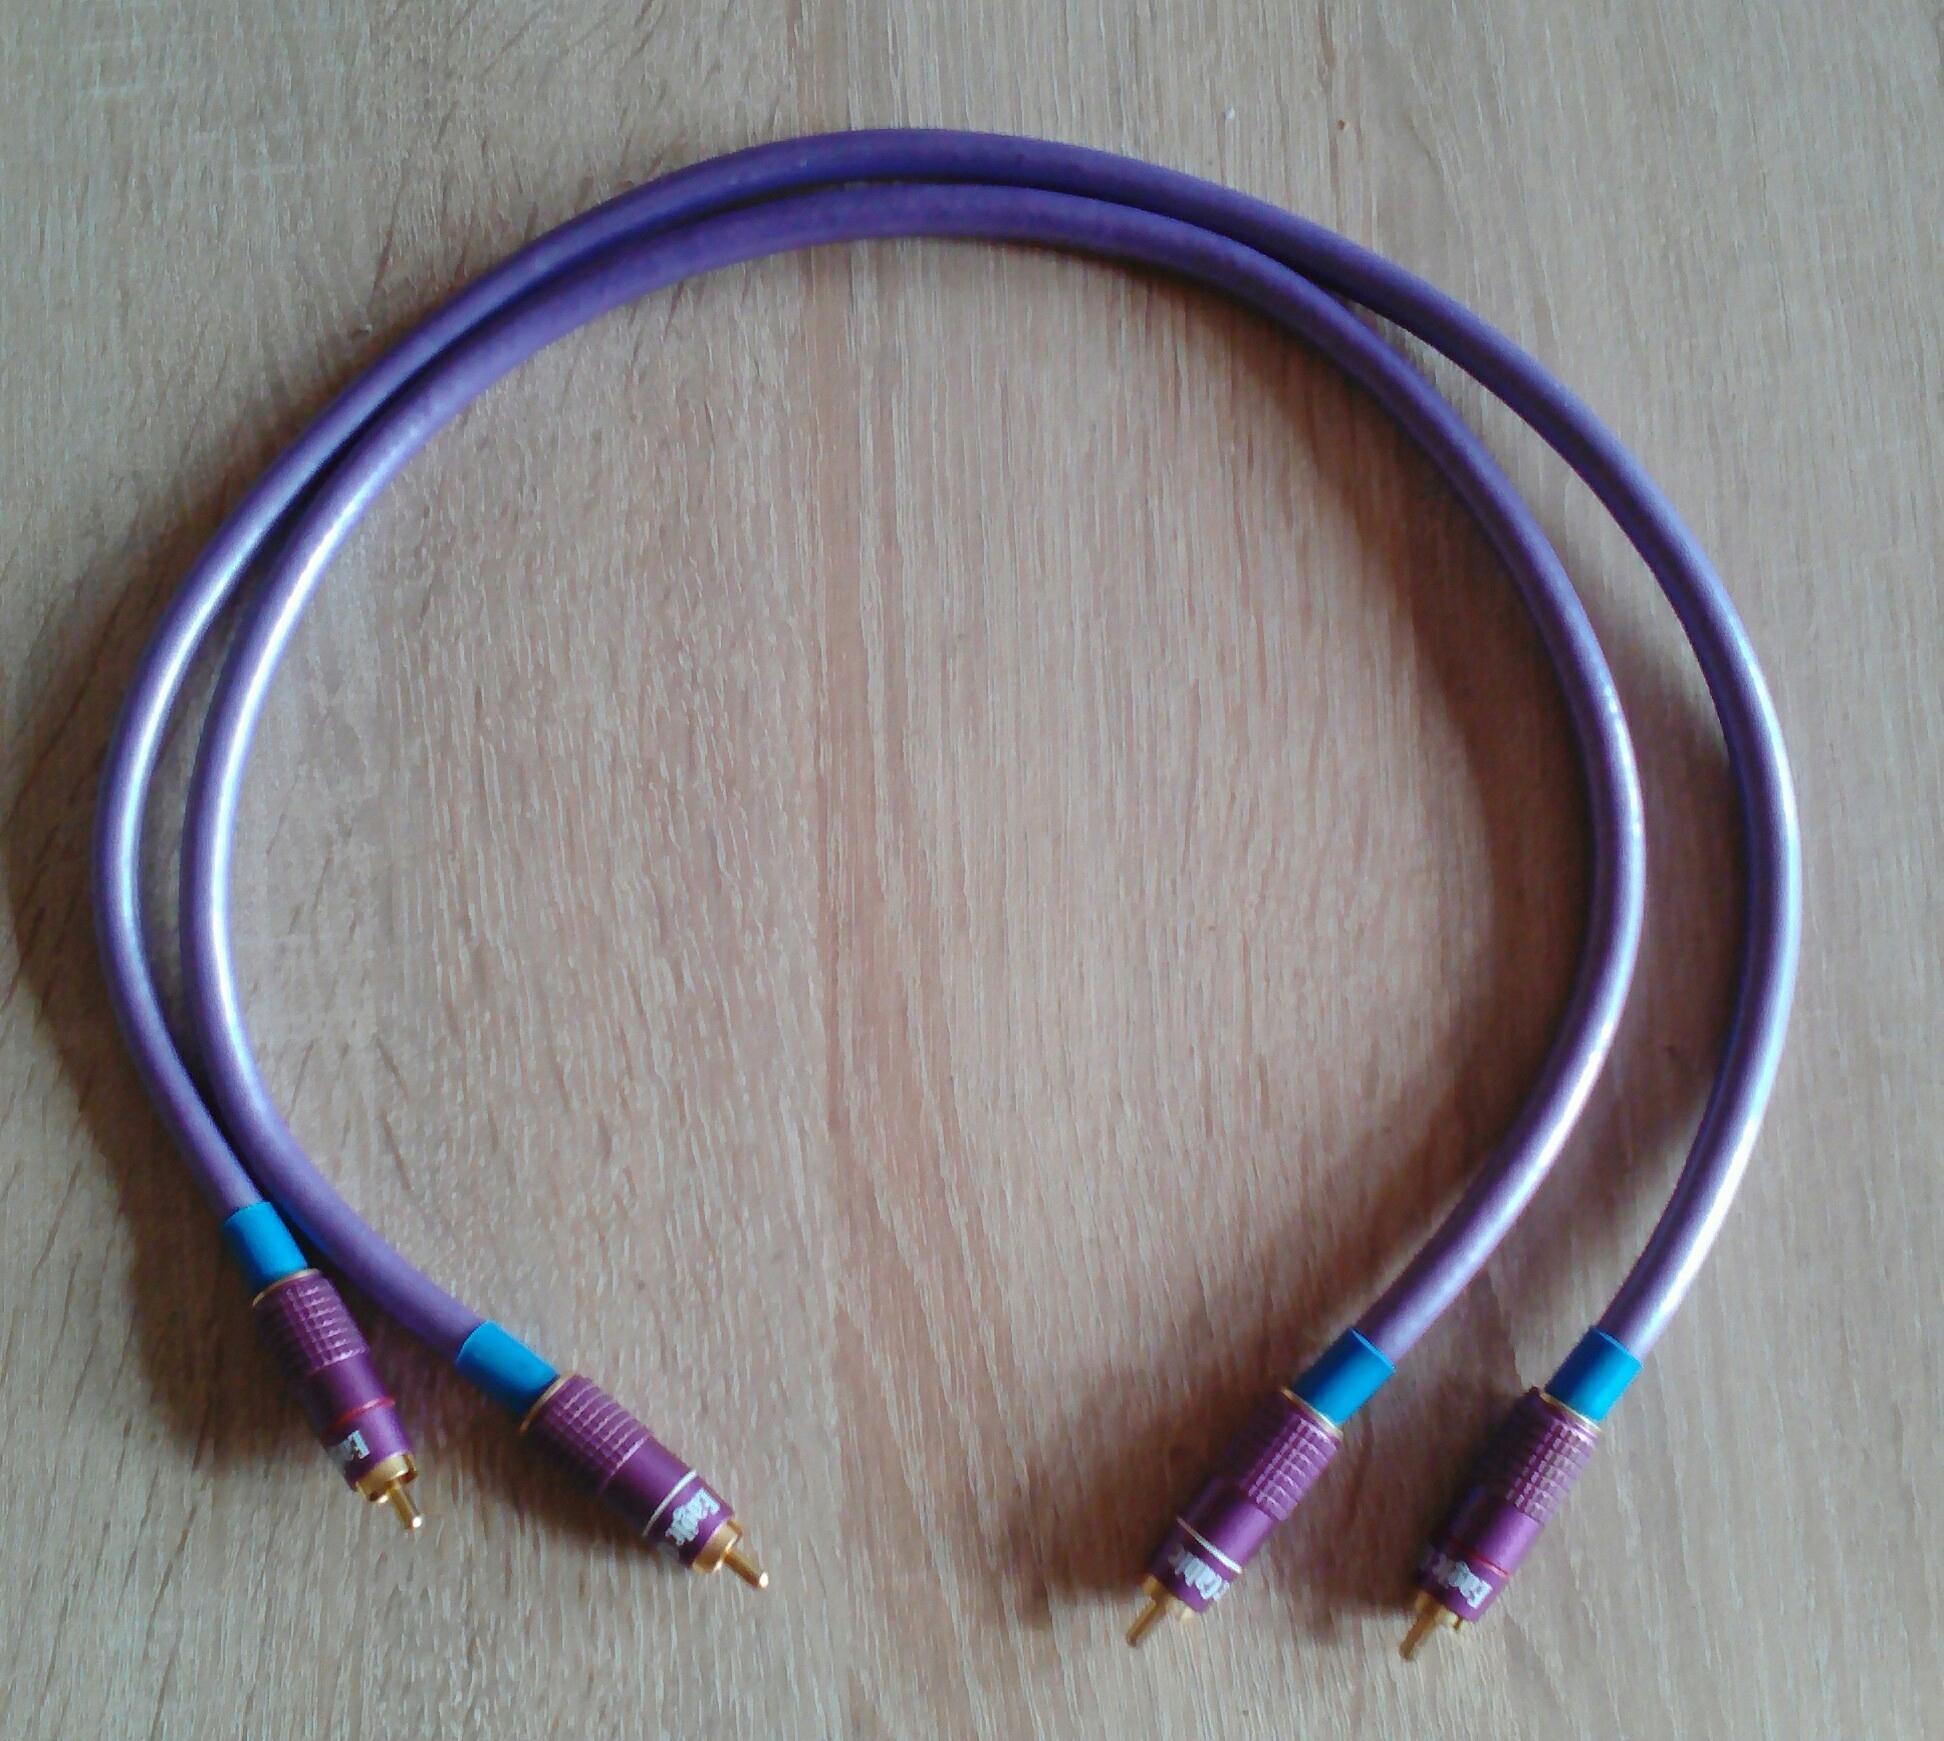 Kabel Interkonekt REAL CABLE MC 90 - 0.6 m. !!!